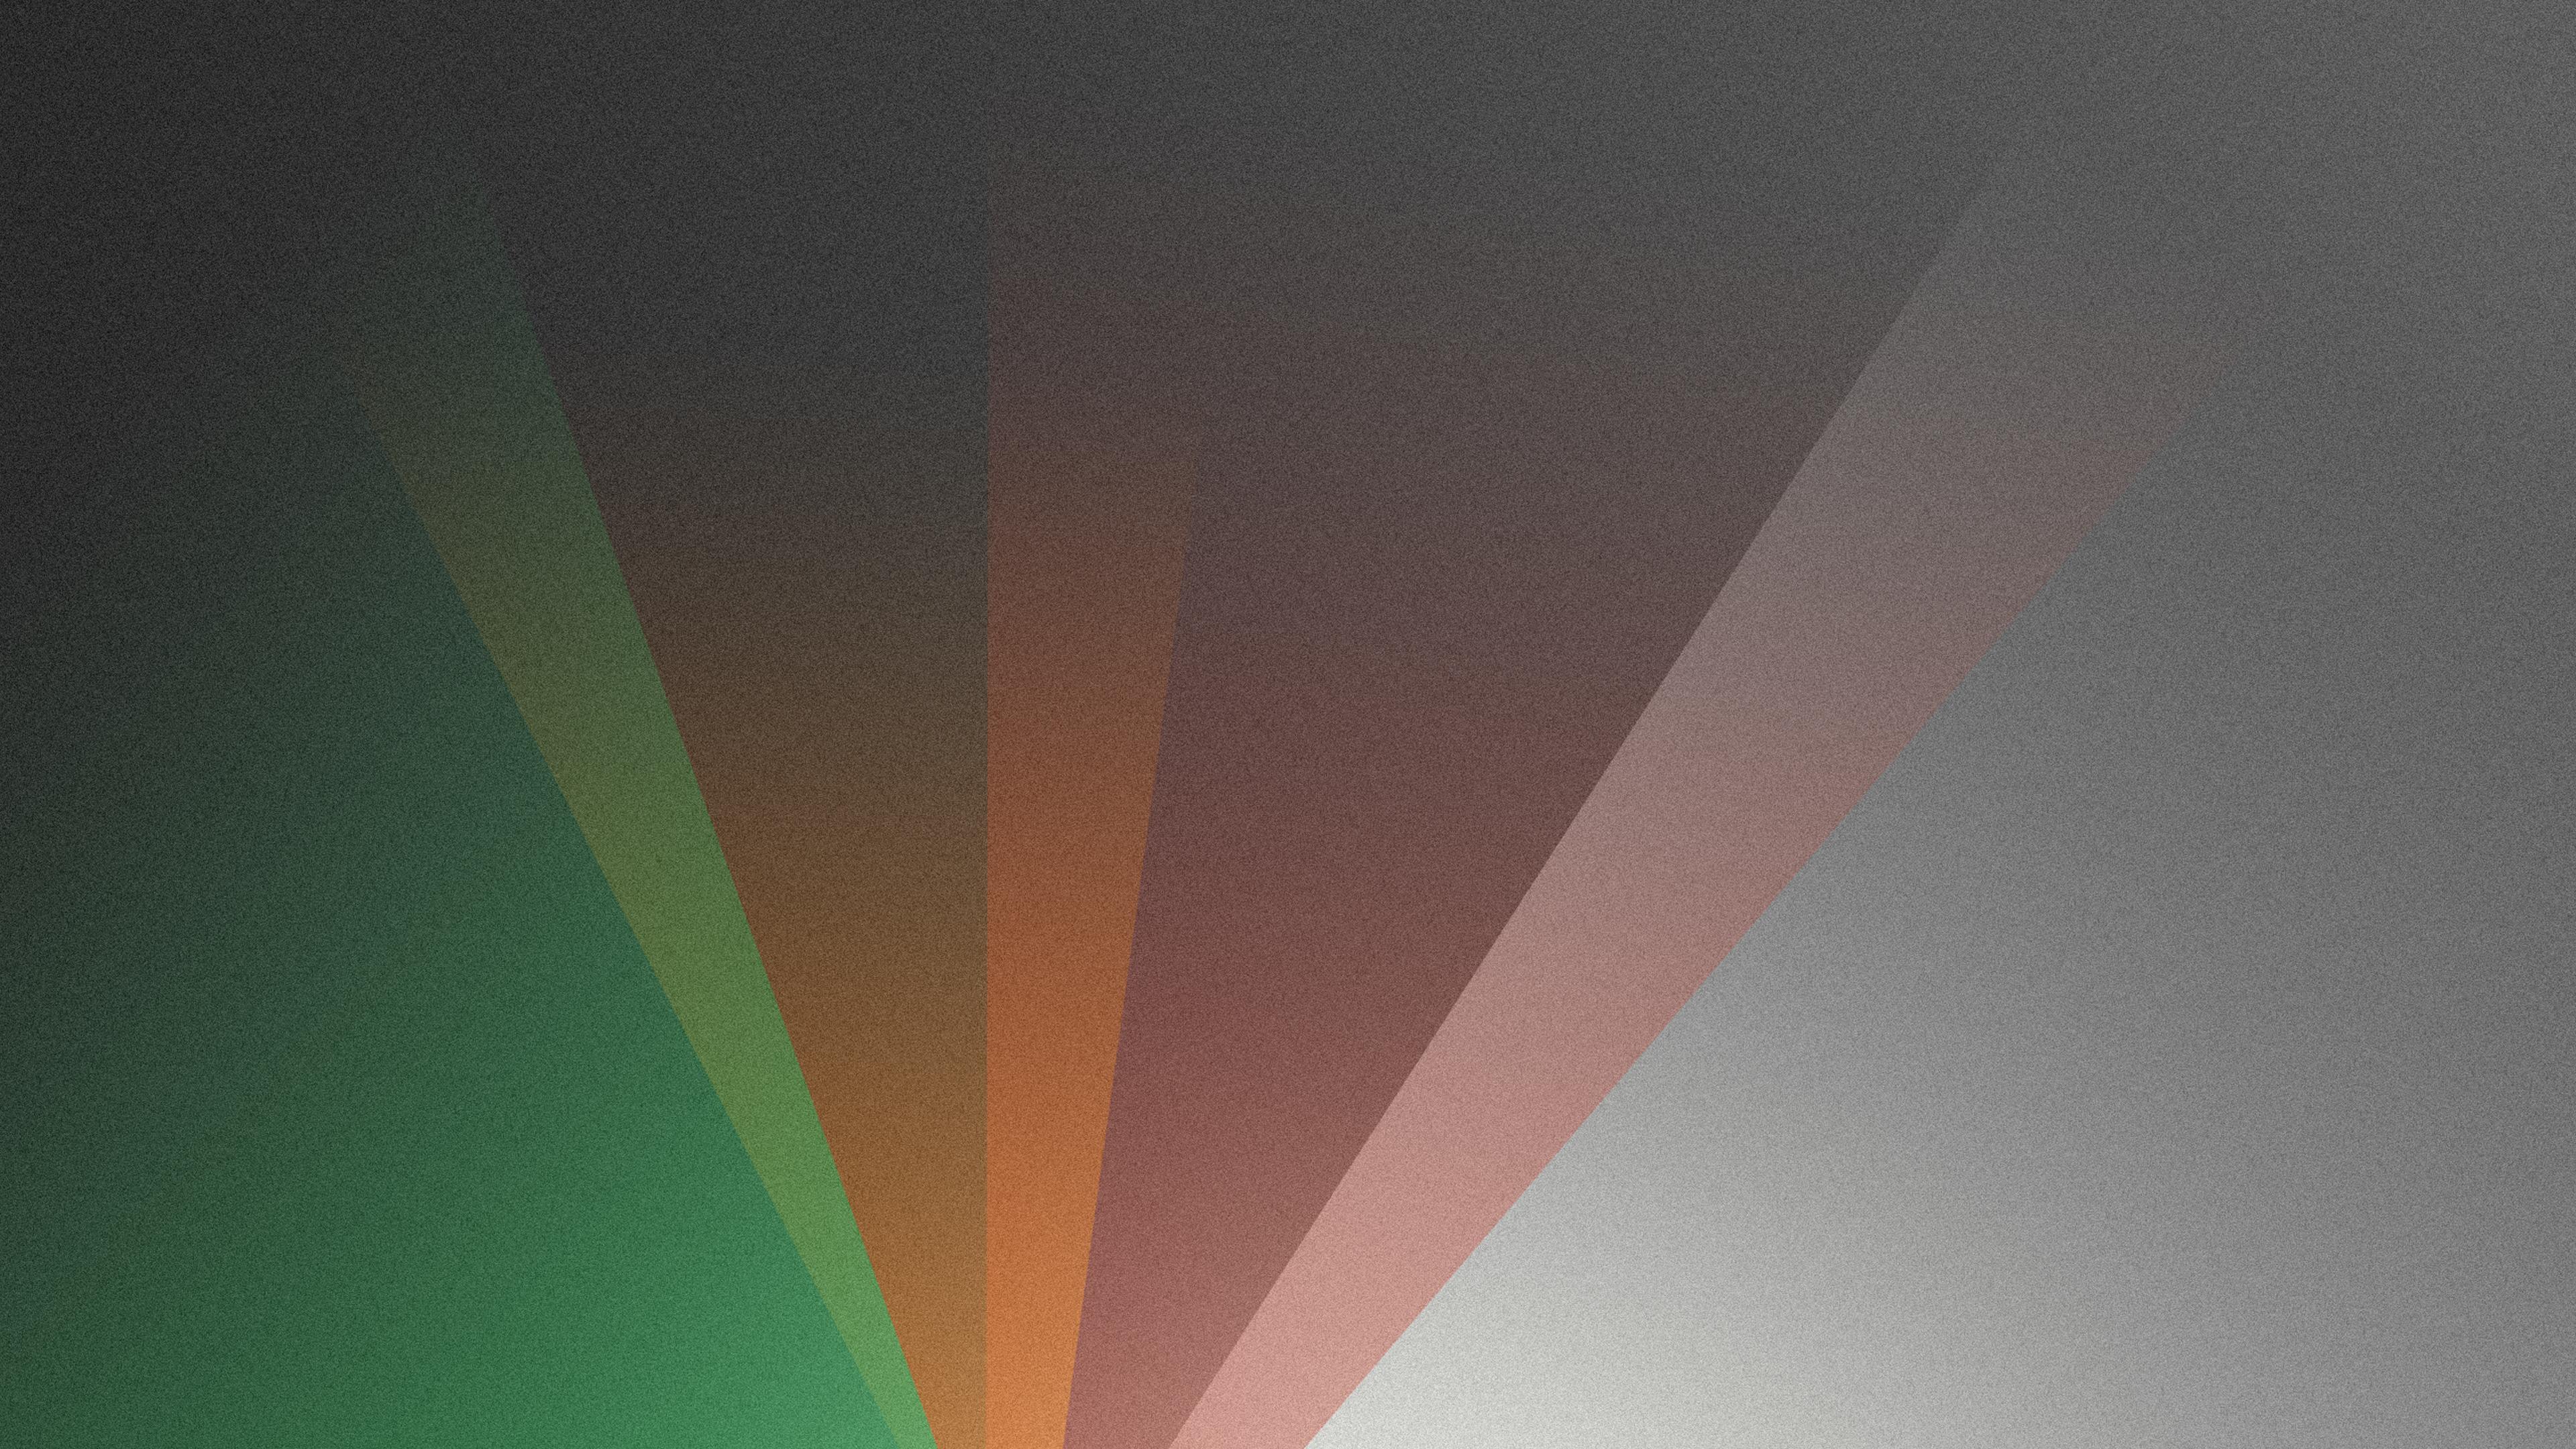 abstract color making 1575660369 - Abstract Color Making -